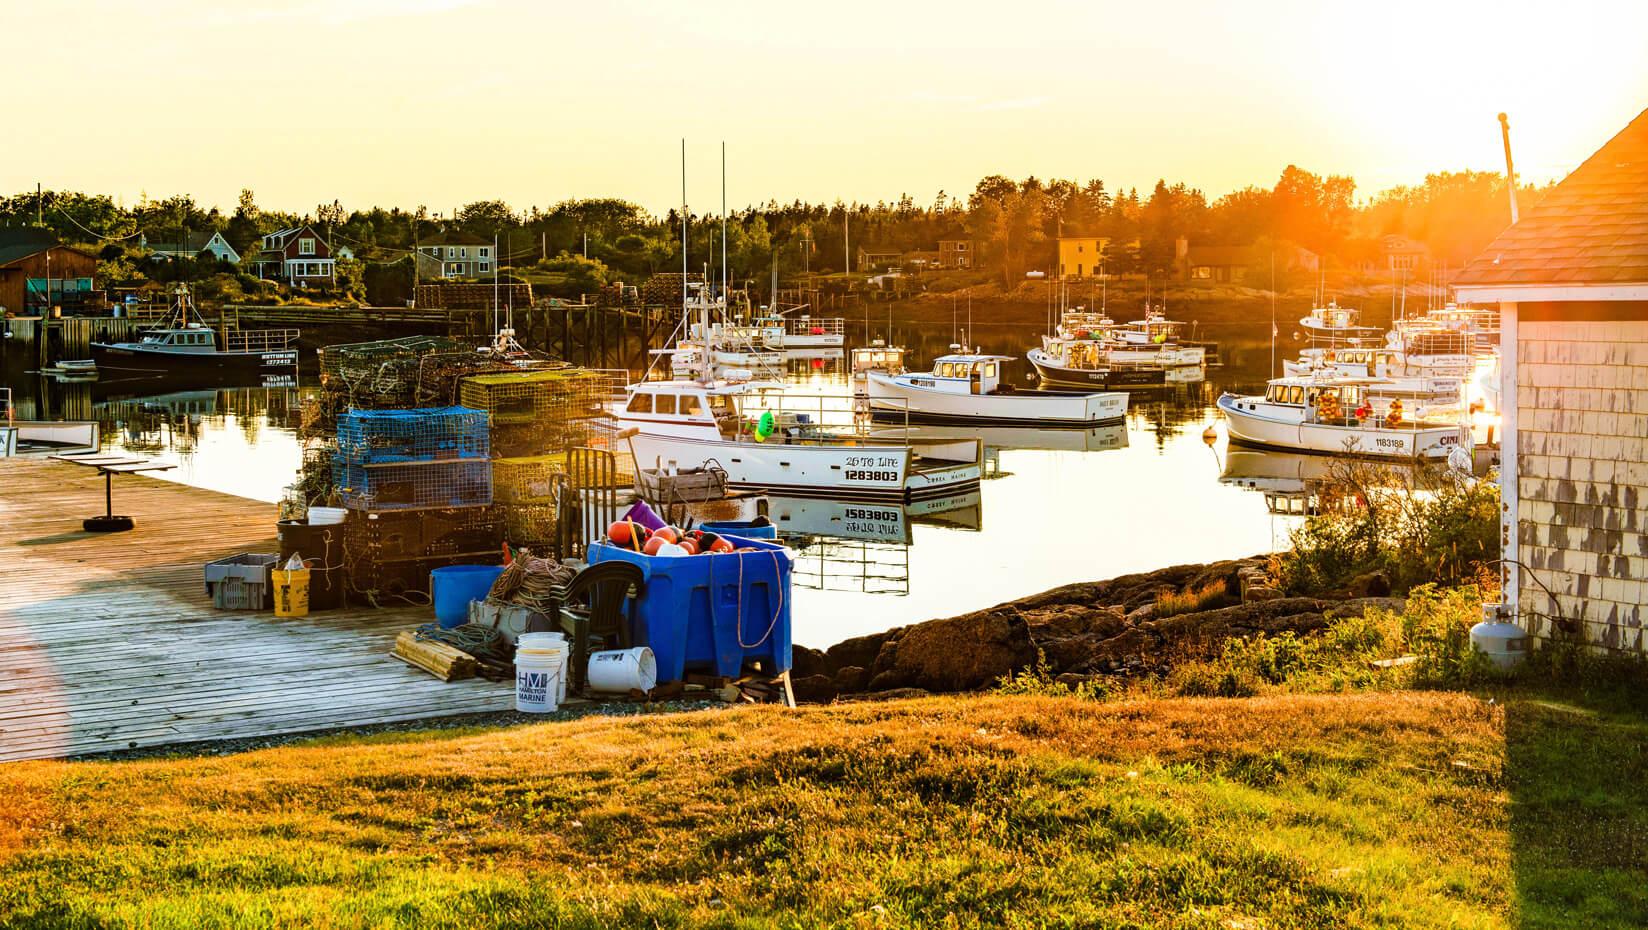 Fishing boats on the Maine coast